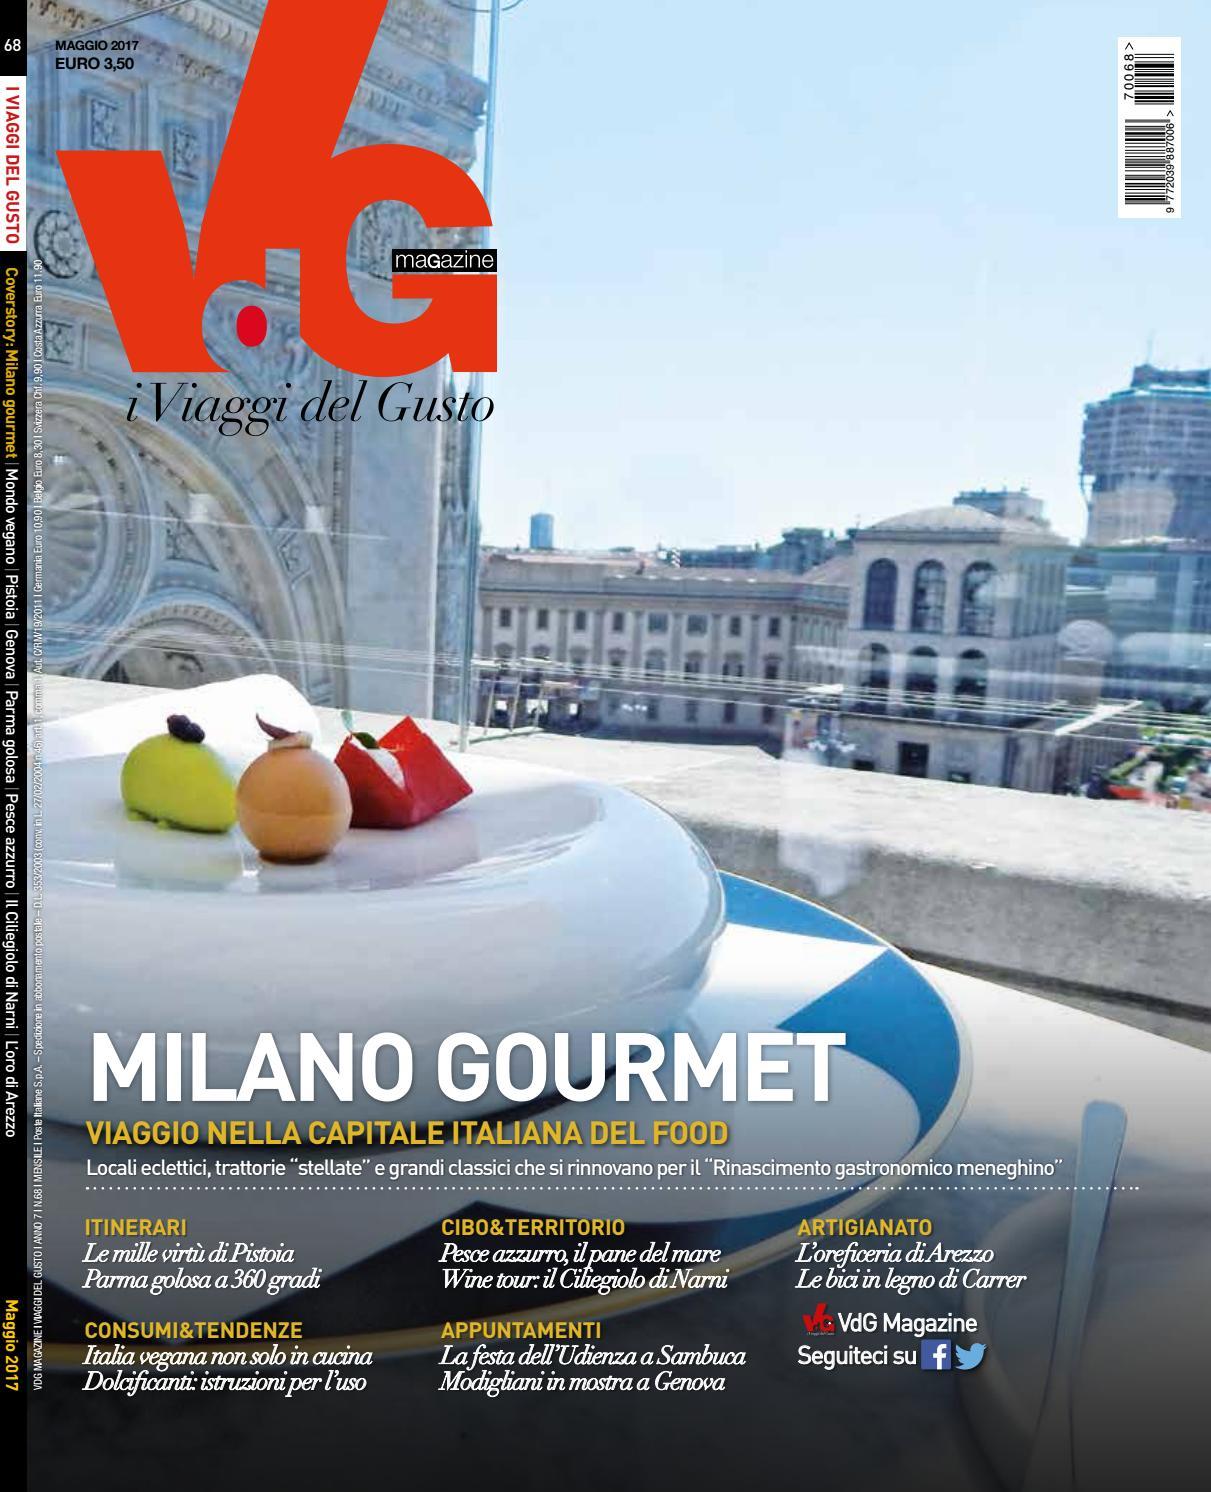 Vdg maggio 2017 by vdgmagazine - issuu 3f6481e5350e